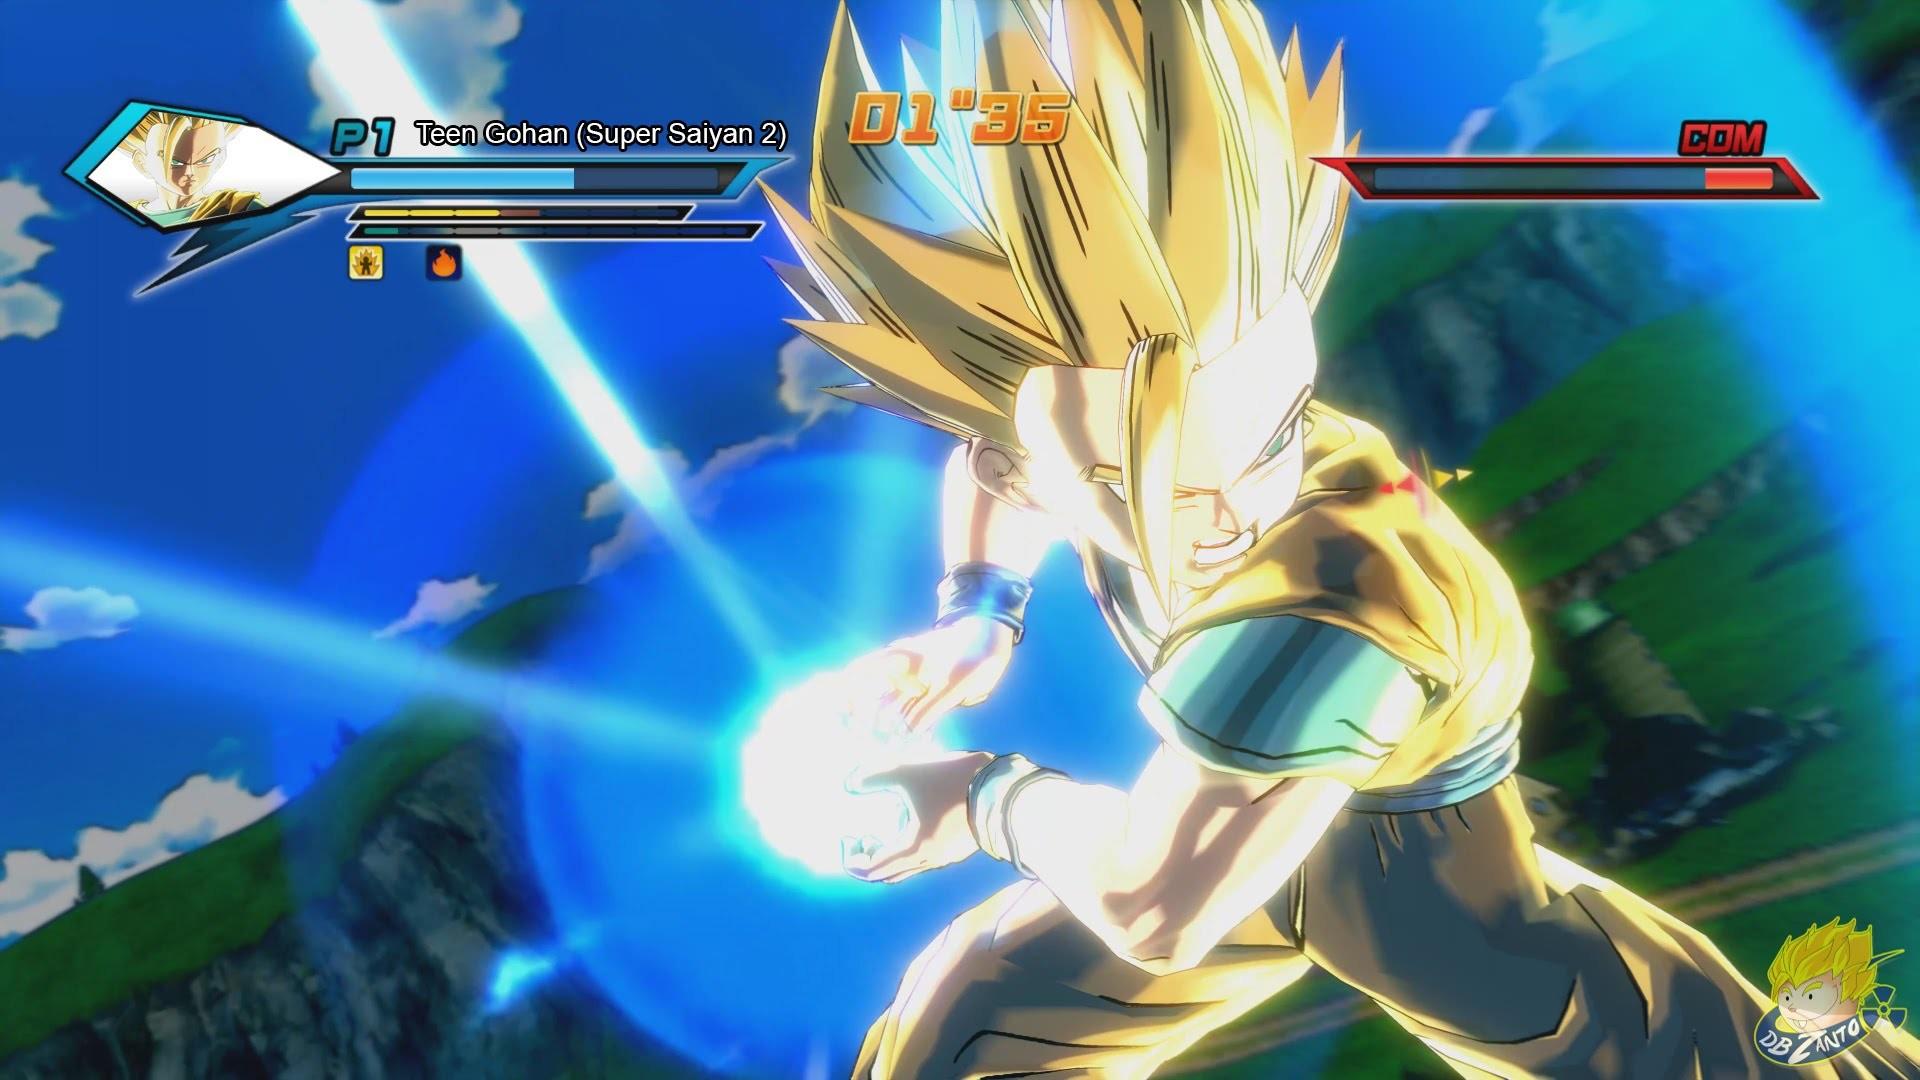 563b19a9 1920x1080 Dragon Ball Z: Battle of Z - | Teen Gohan Transforms Into A Super  Saiyan 2 |〠FULL HDã€' - YouTube